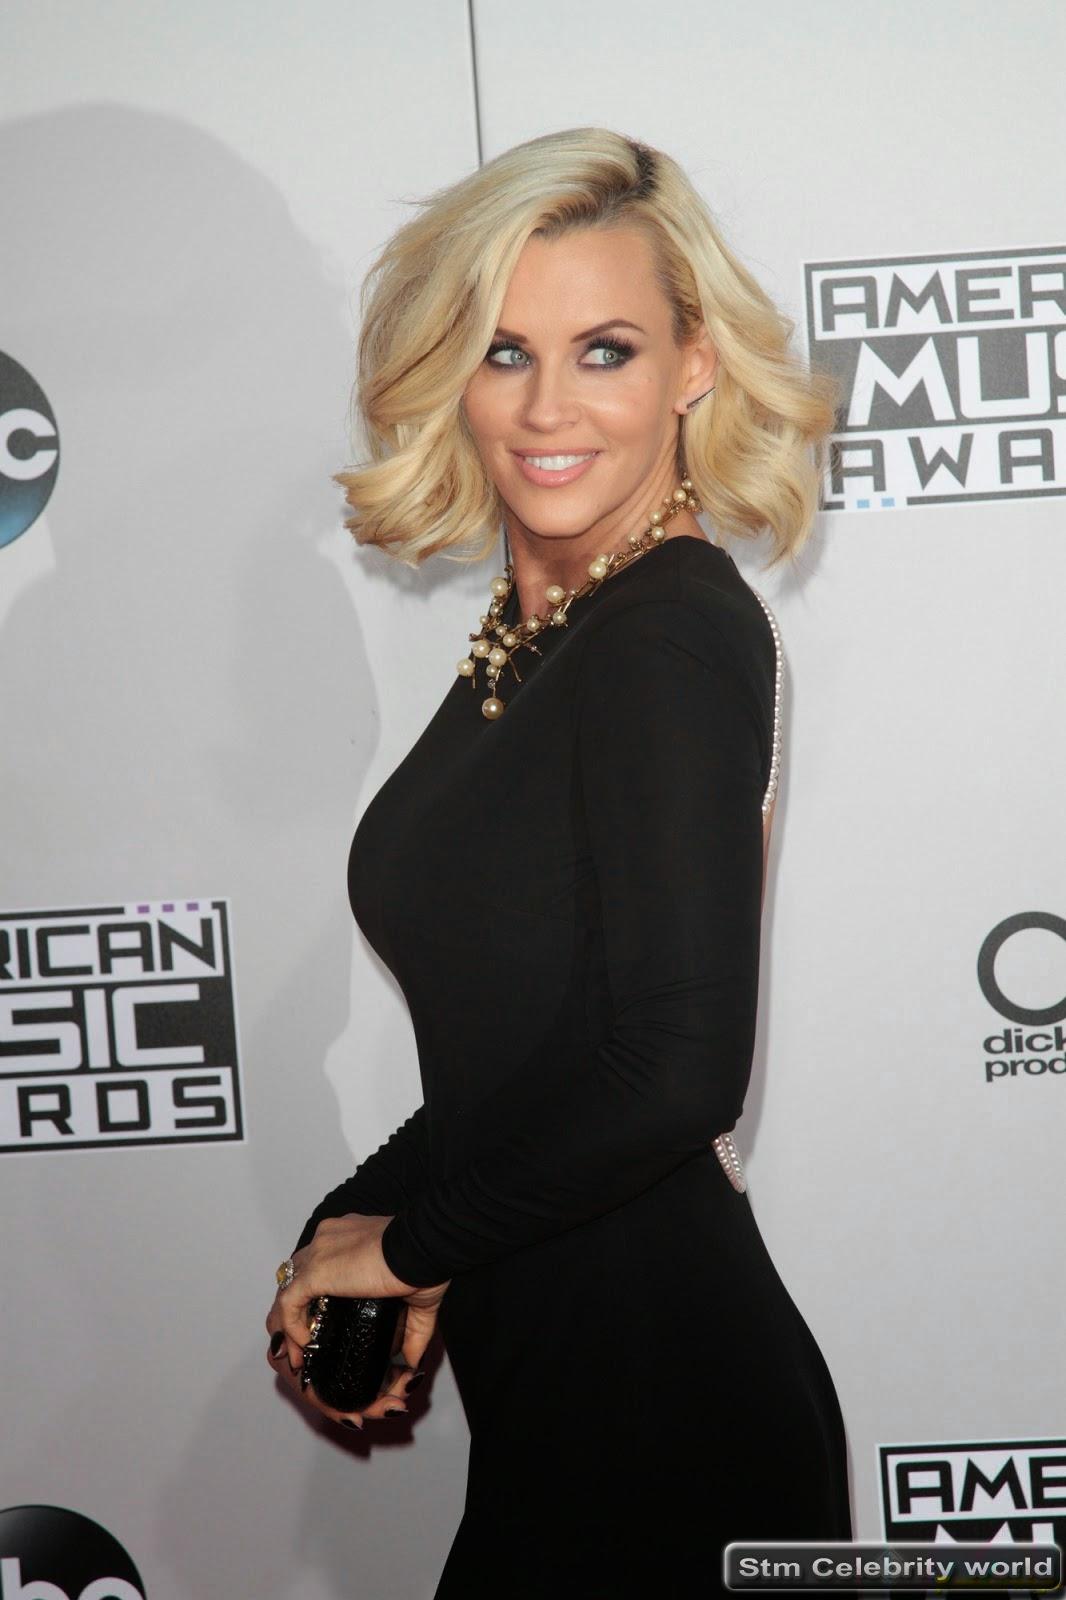 Jenny Mccarthy Sexy Hollywood Acrtess Photos Gallery-7893